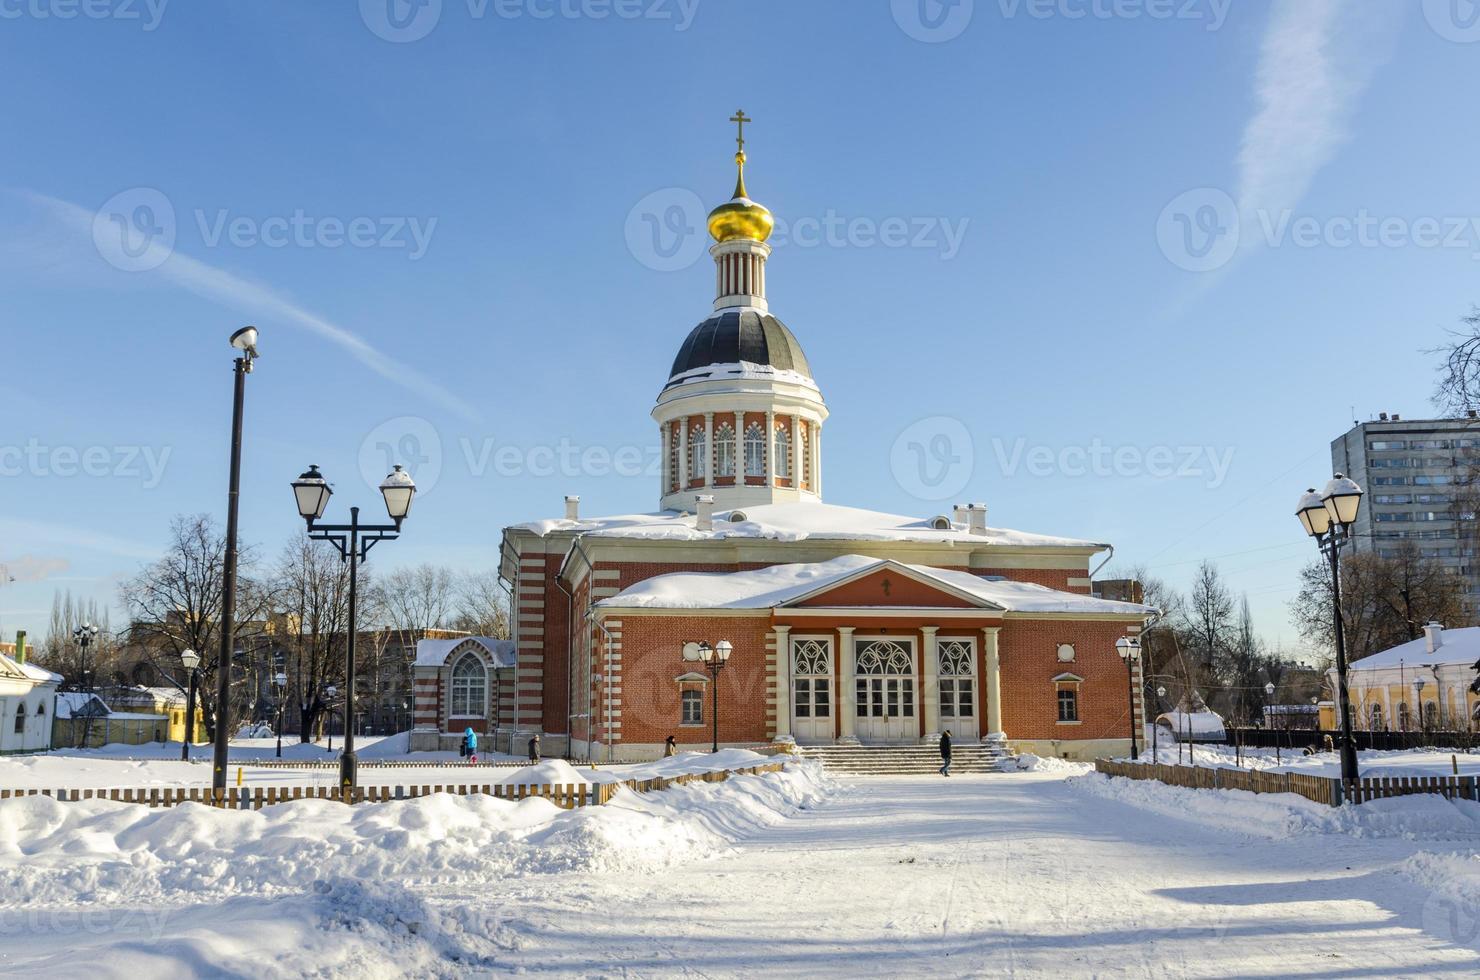 Église orthodoxe à Moscou, Russie hiver, photo